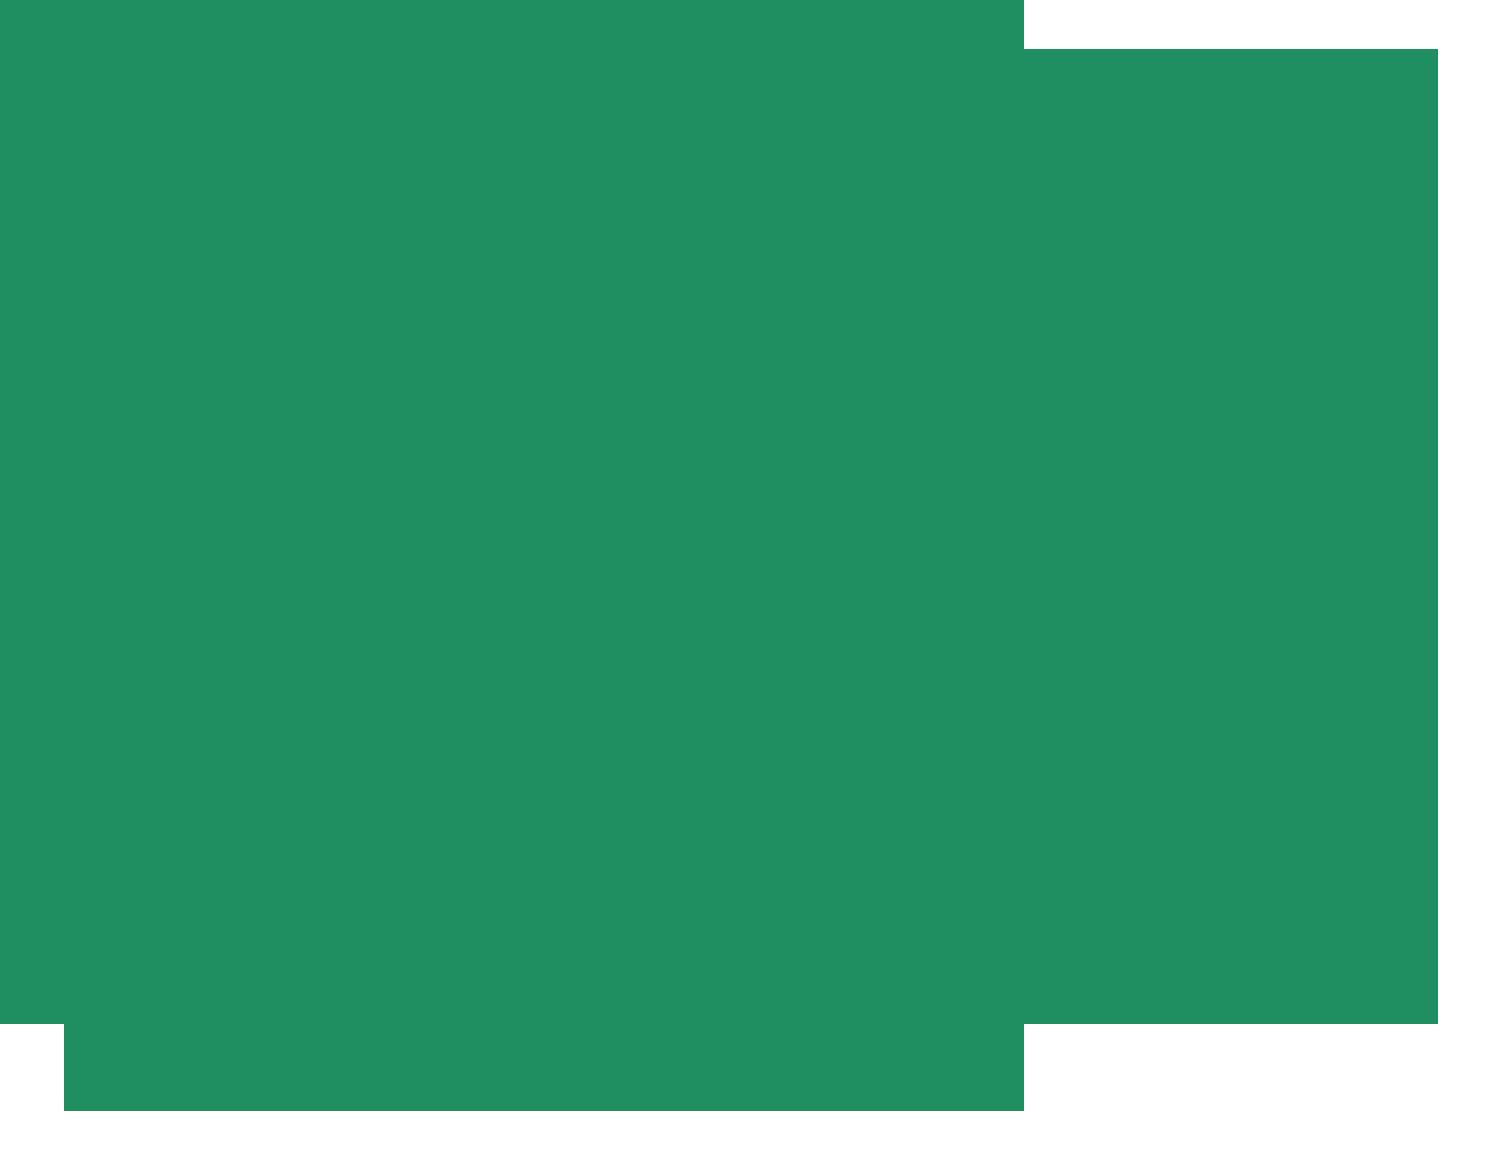 bloom-graphics-tree